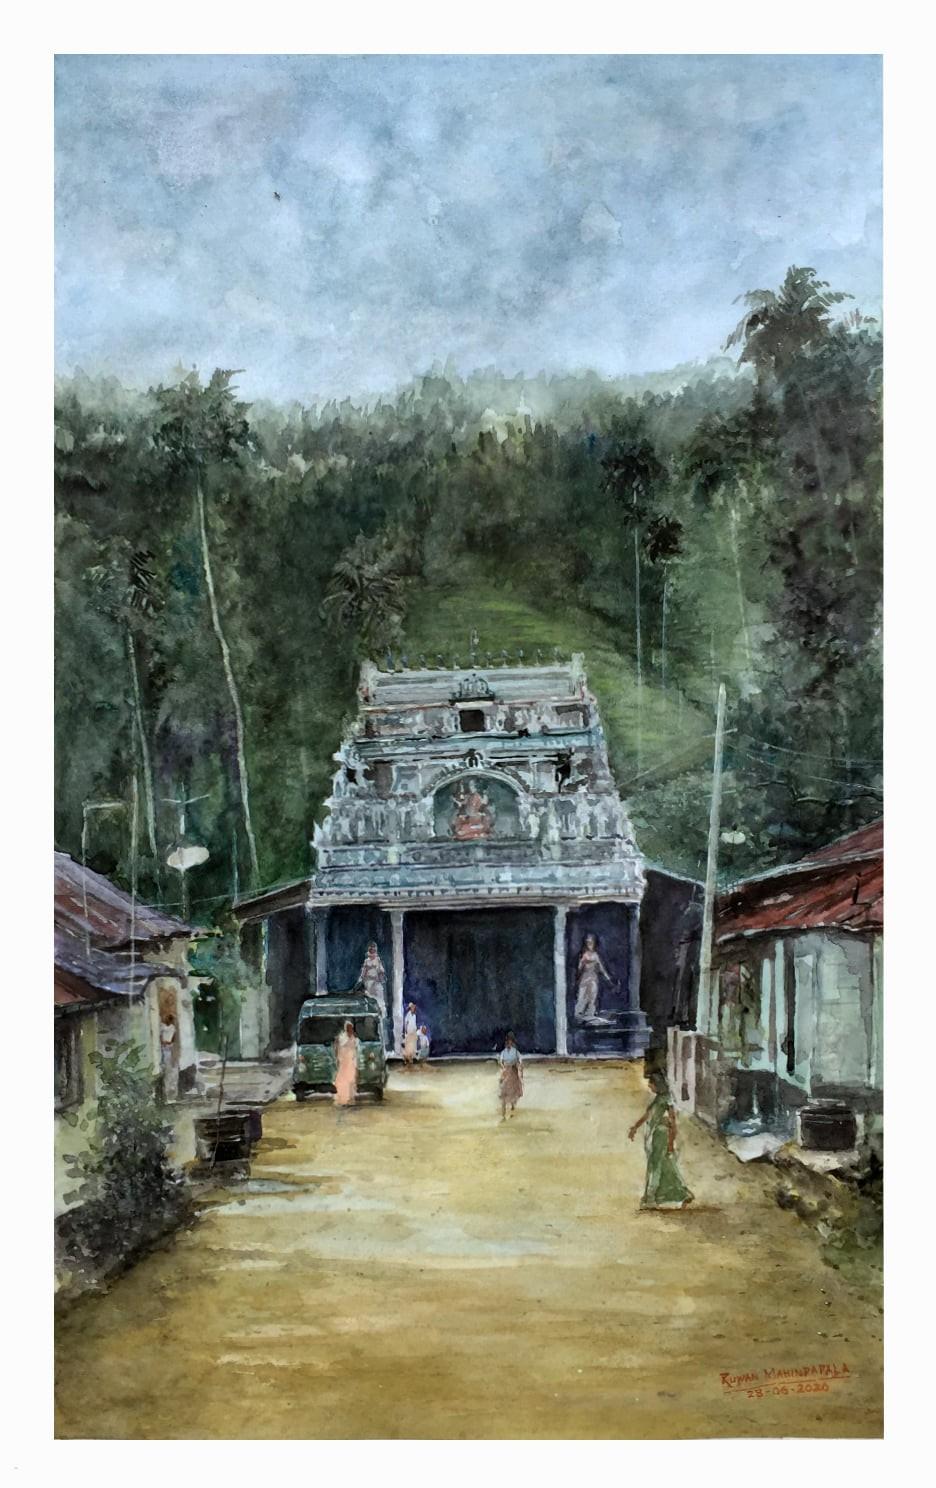 Hindu Temple in Koslanda, by RUWAN MAHINDAPALA